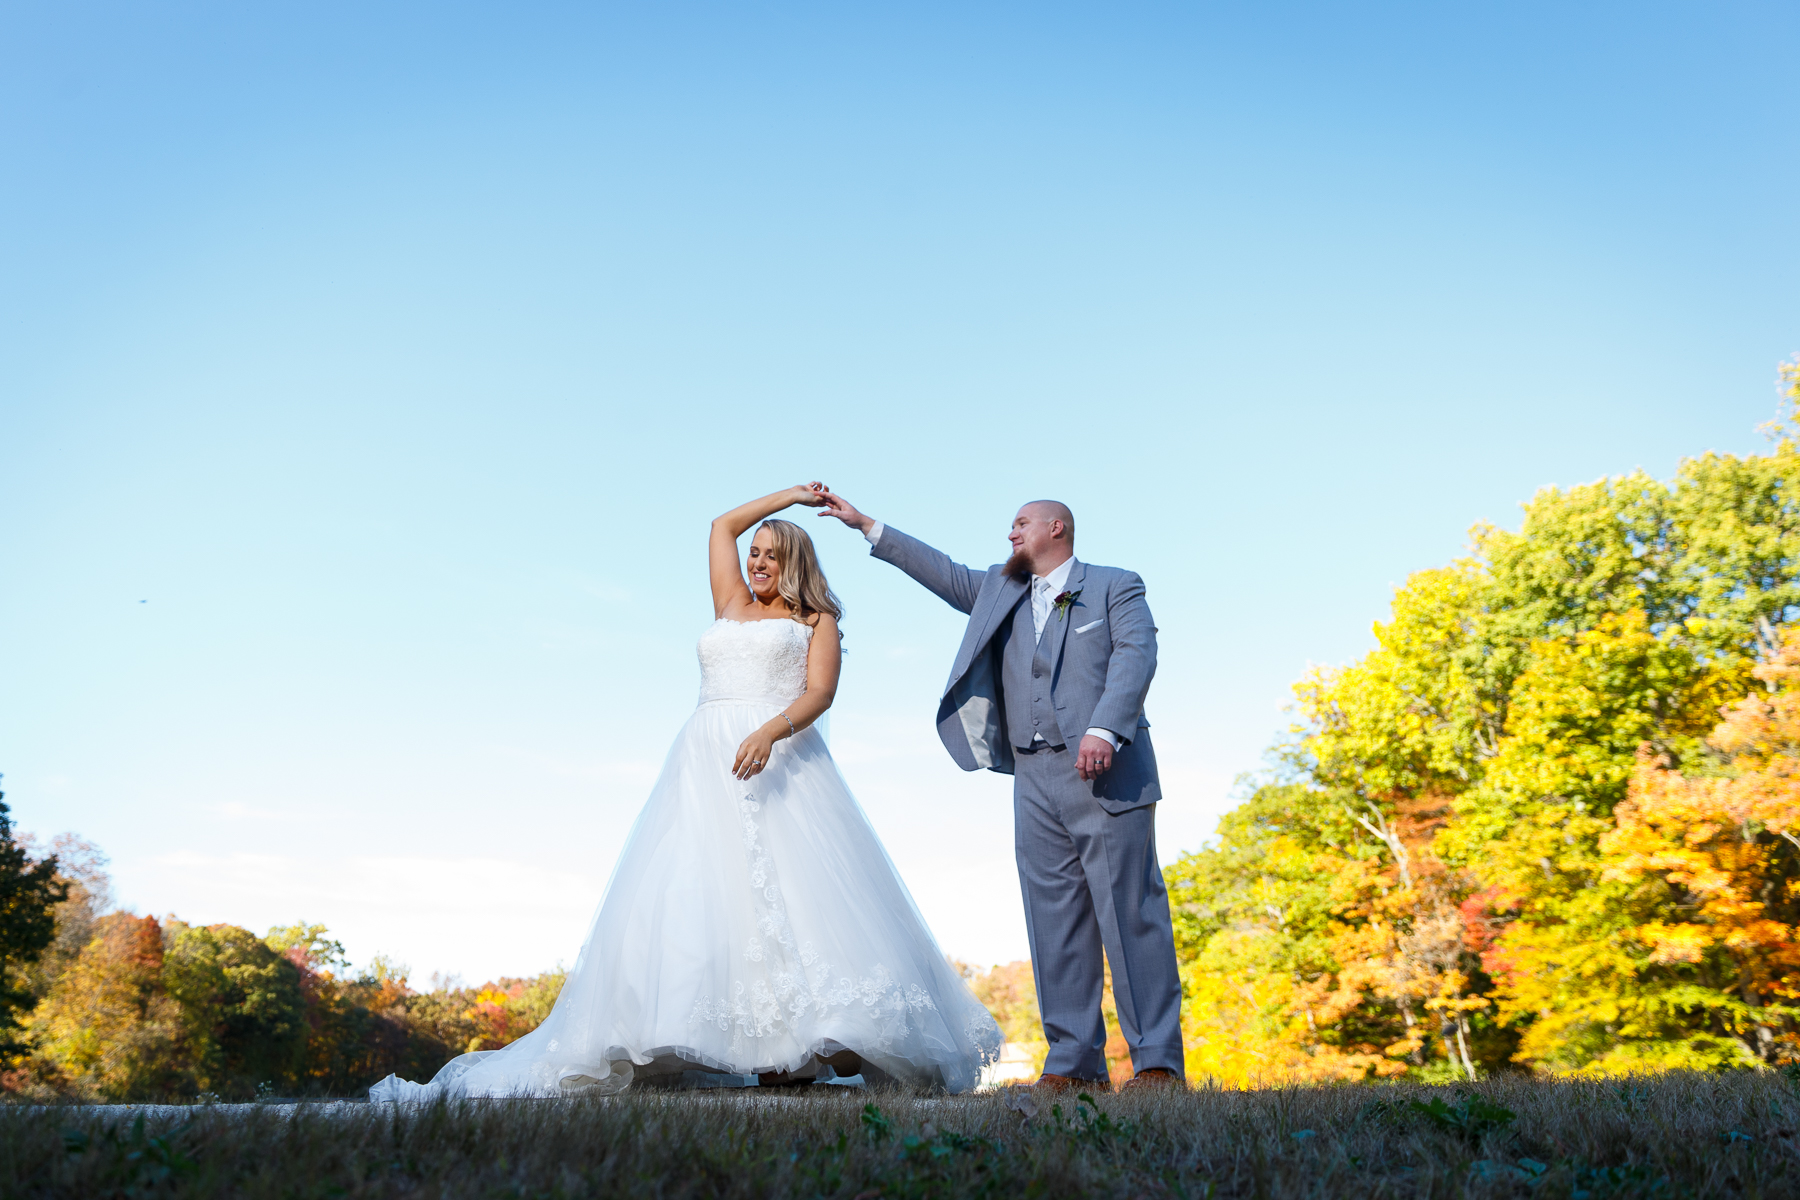 Caitlin and Brandon Wedding_  Jonathan Heisler  _ _ 10152016 _ 435.jpg